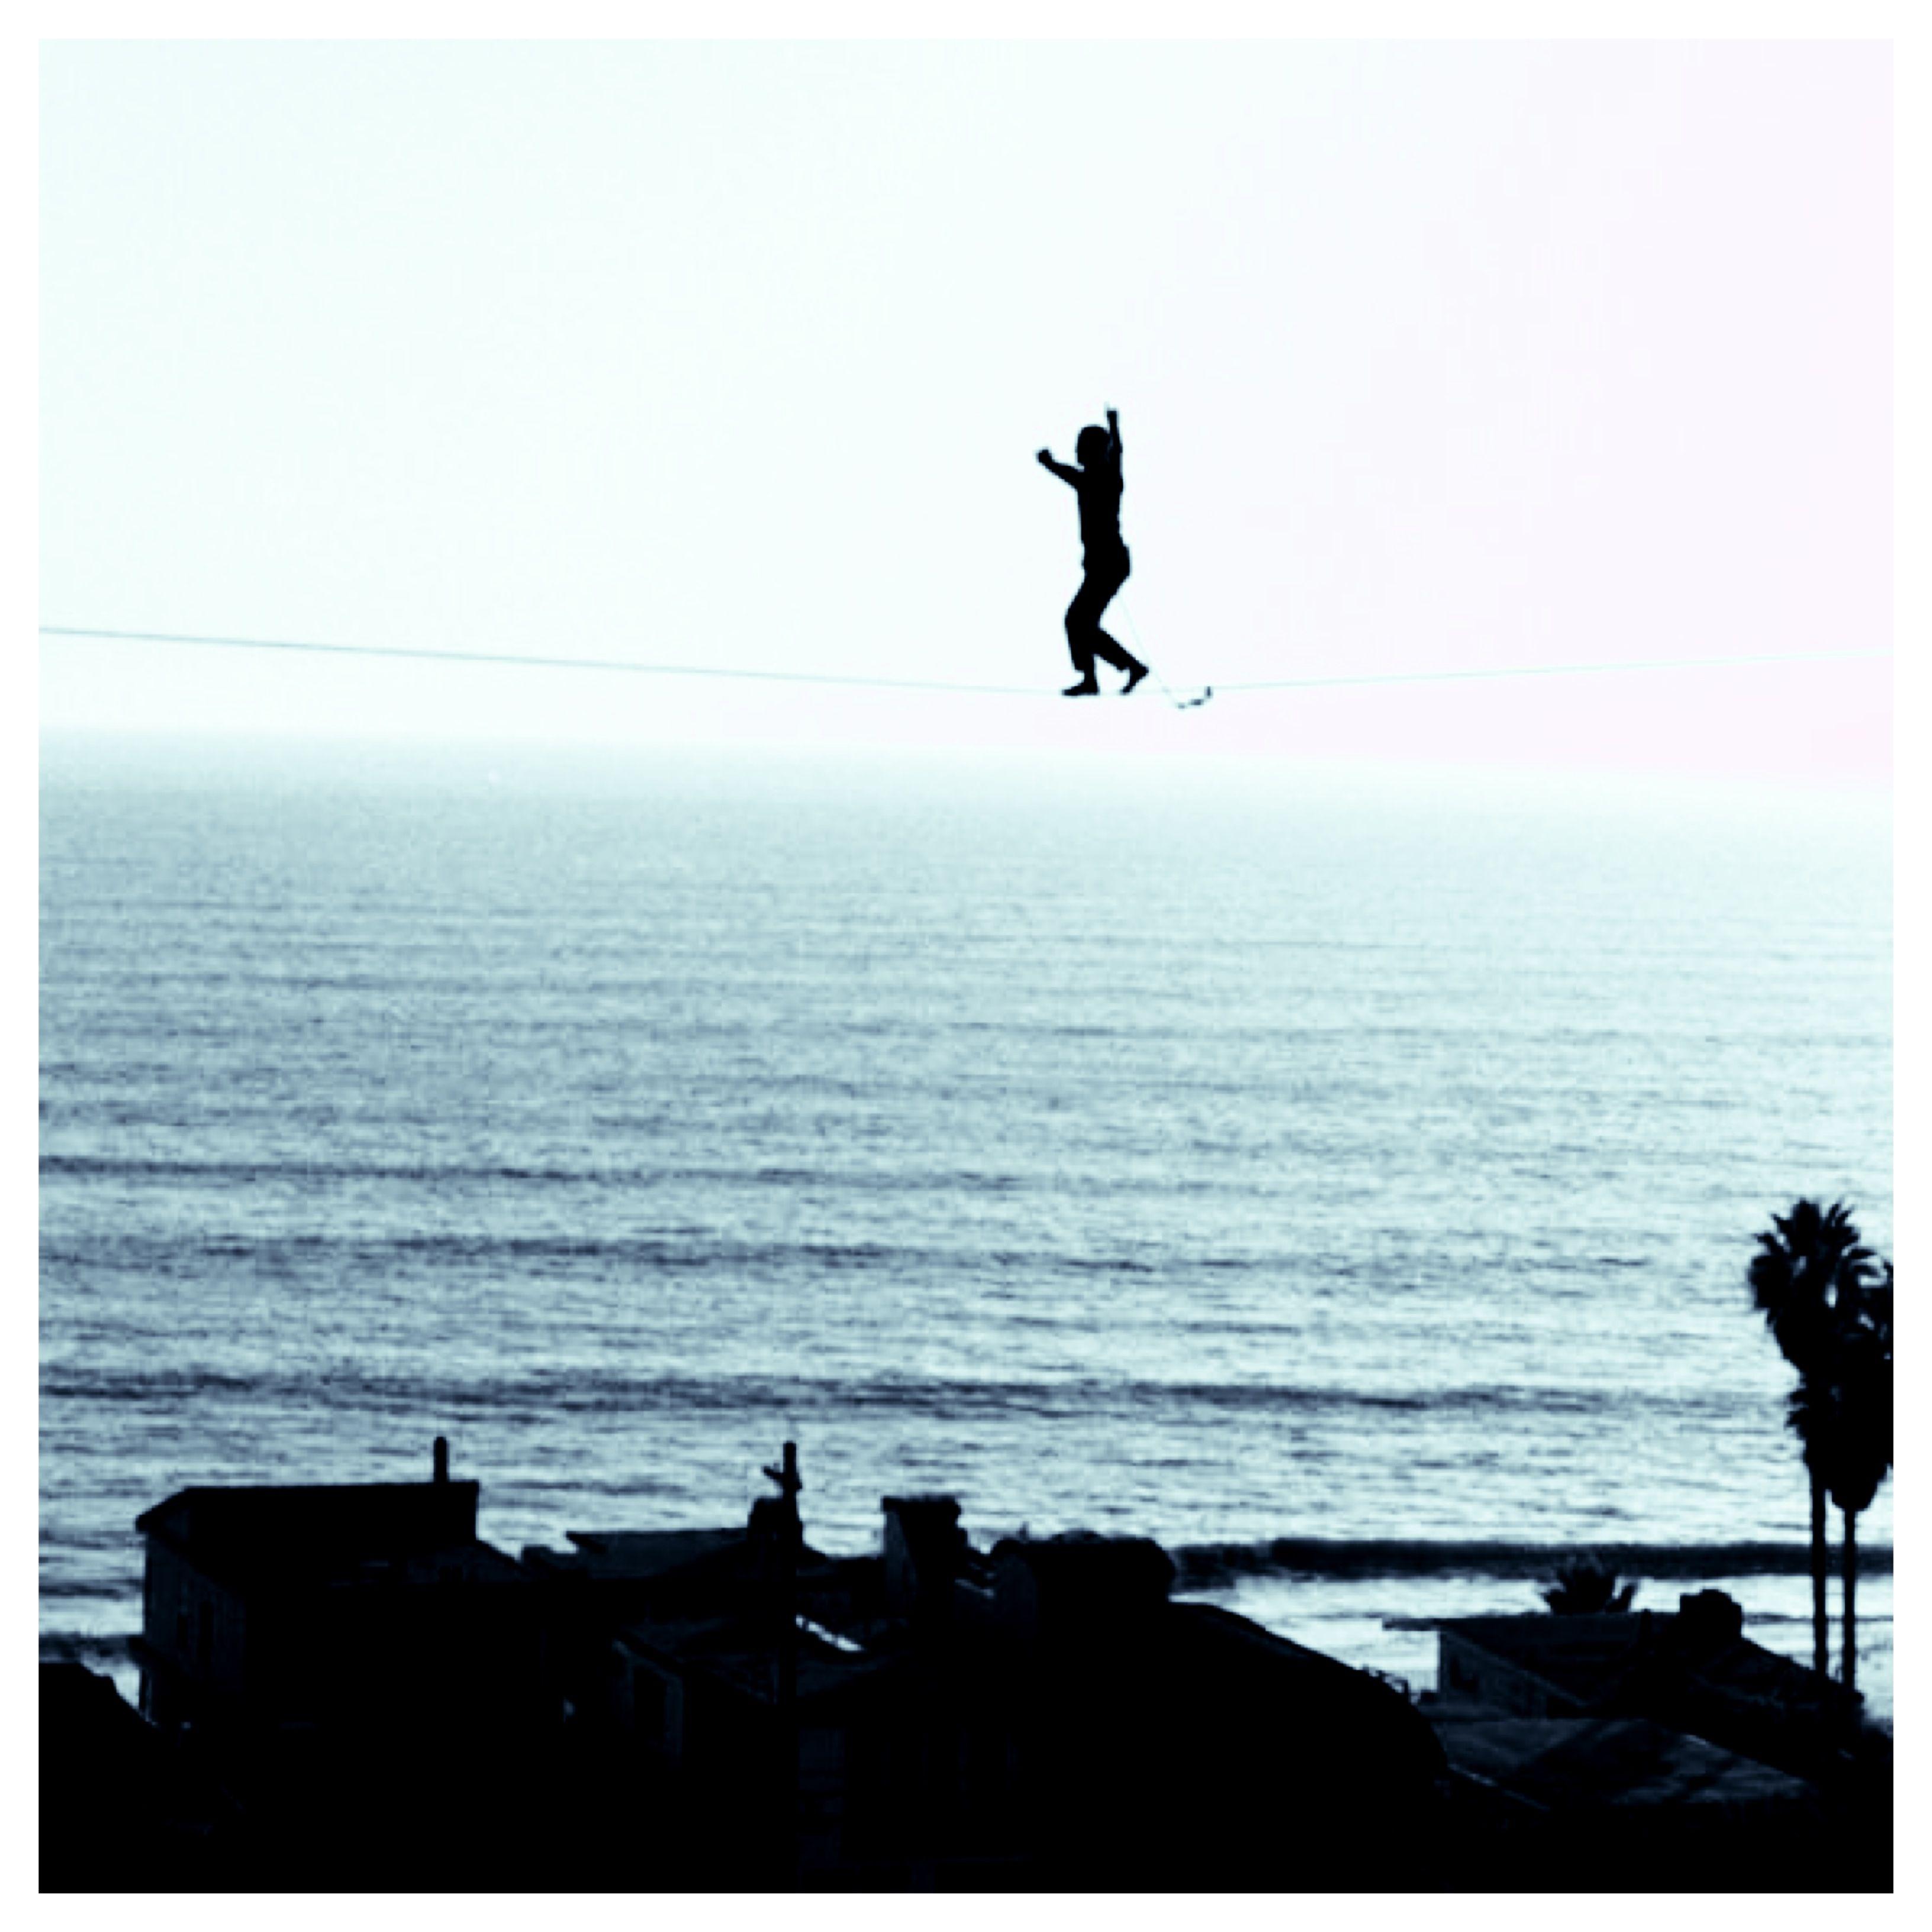 Take risks. Tightrope walker. | be happy | Pinterest